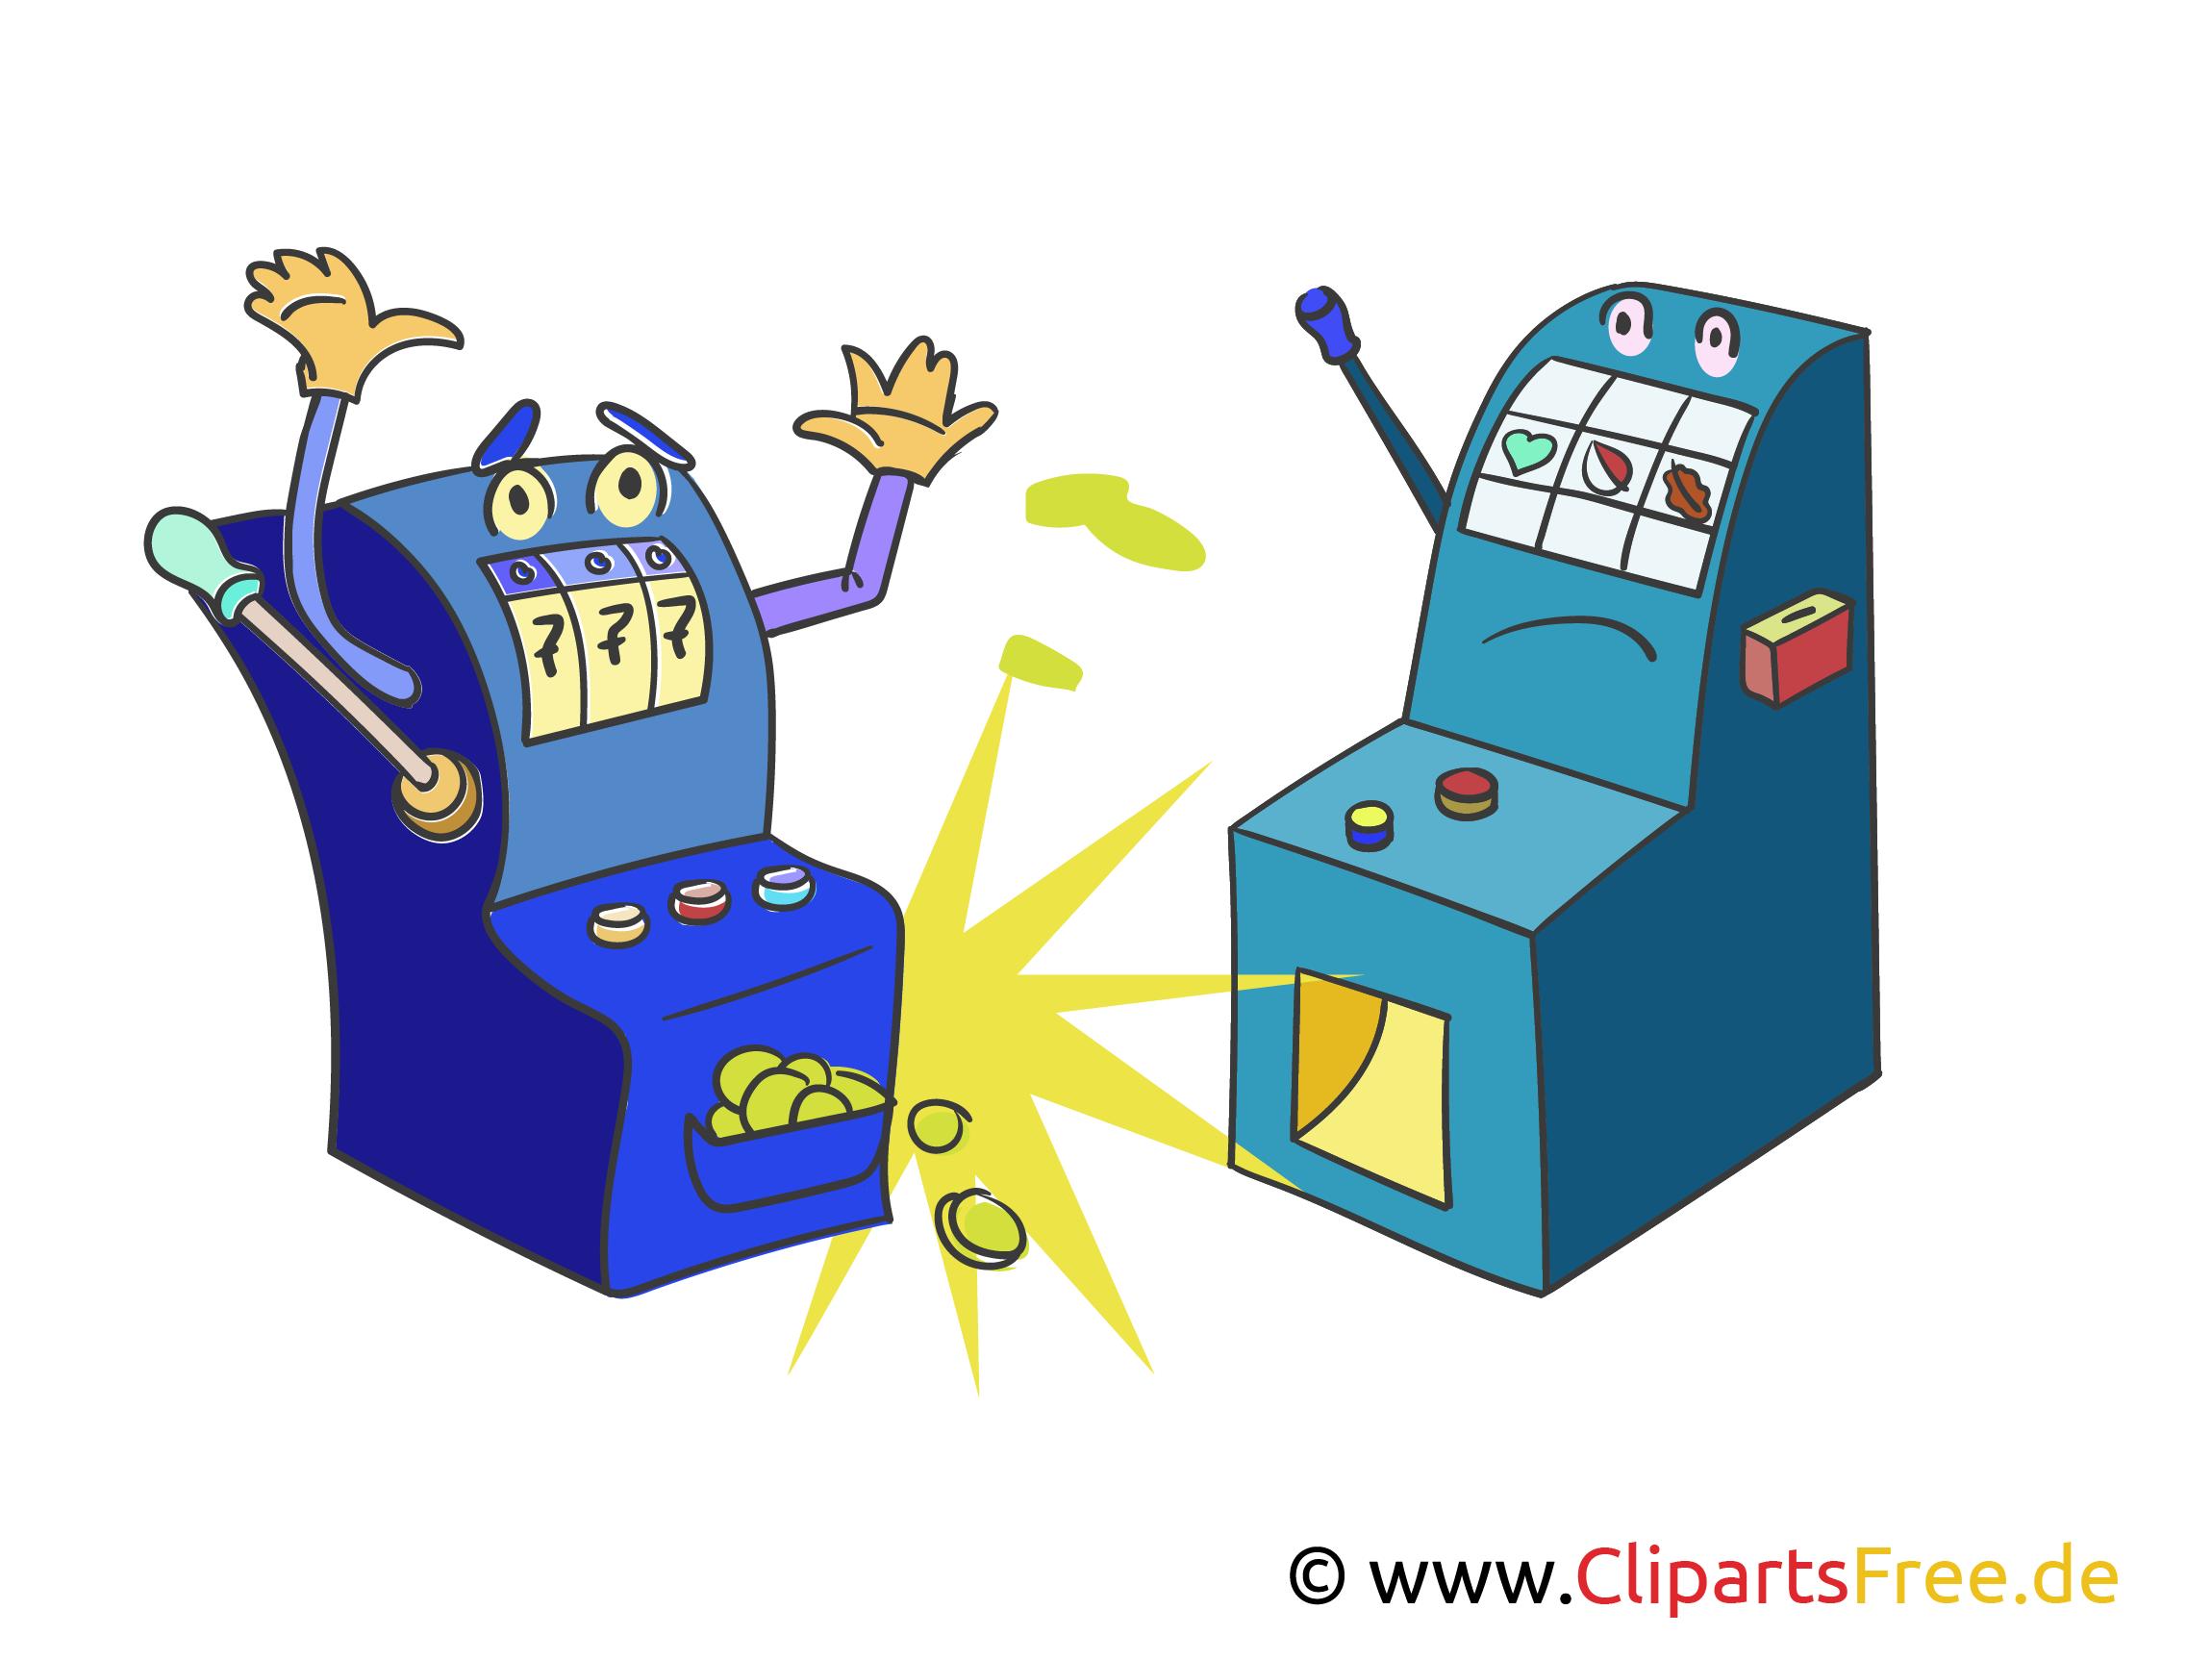 Gewinn in Casino Illustration, Bild, Clipart